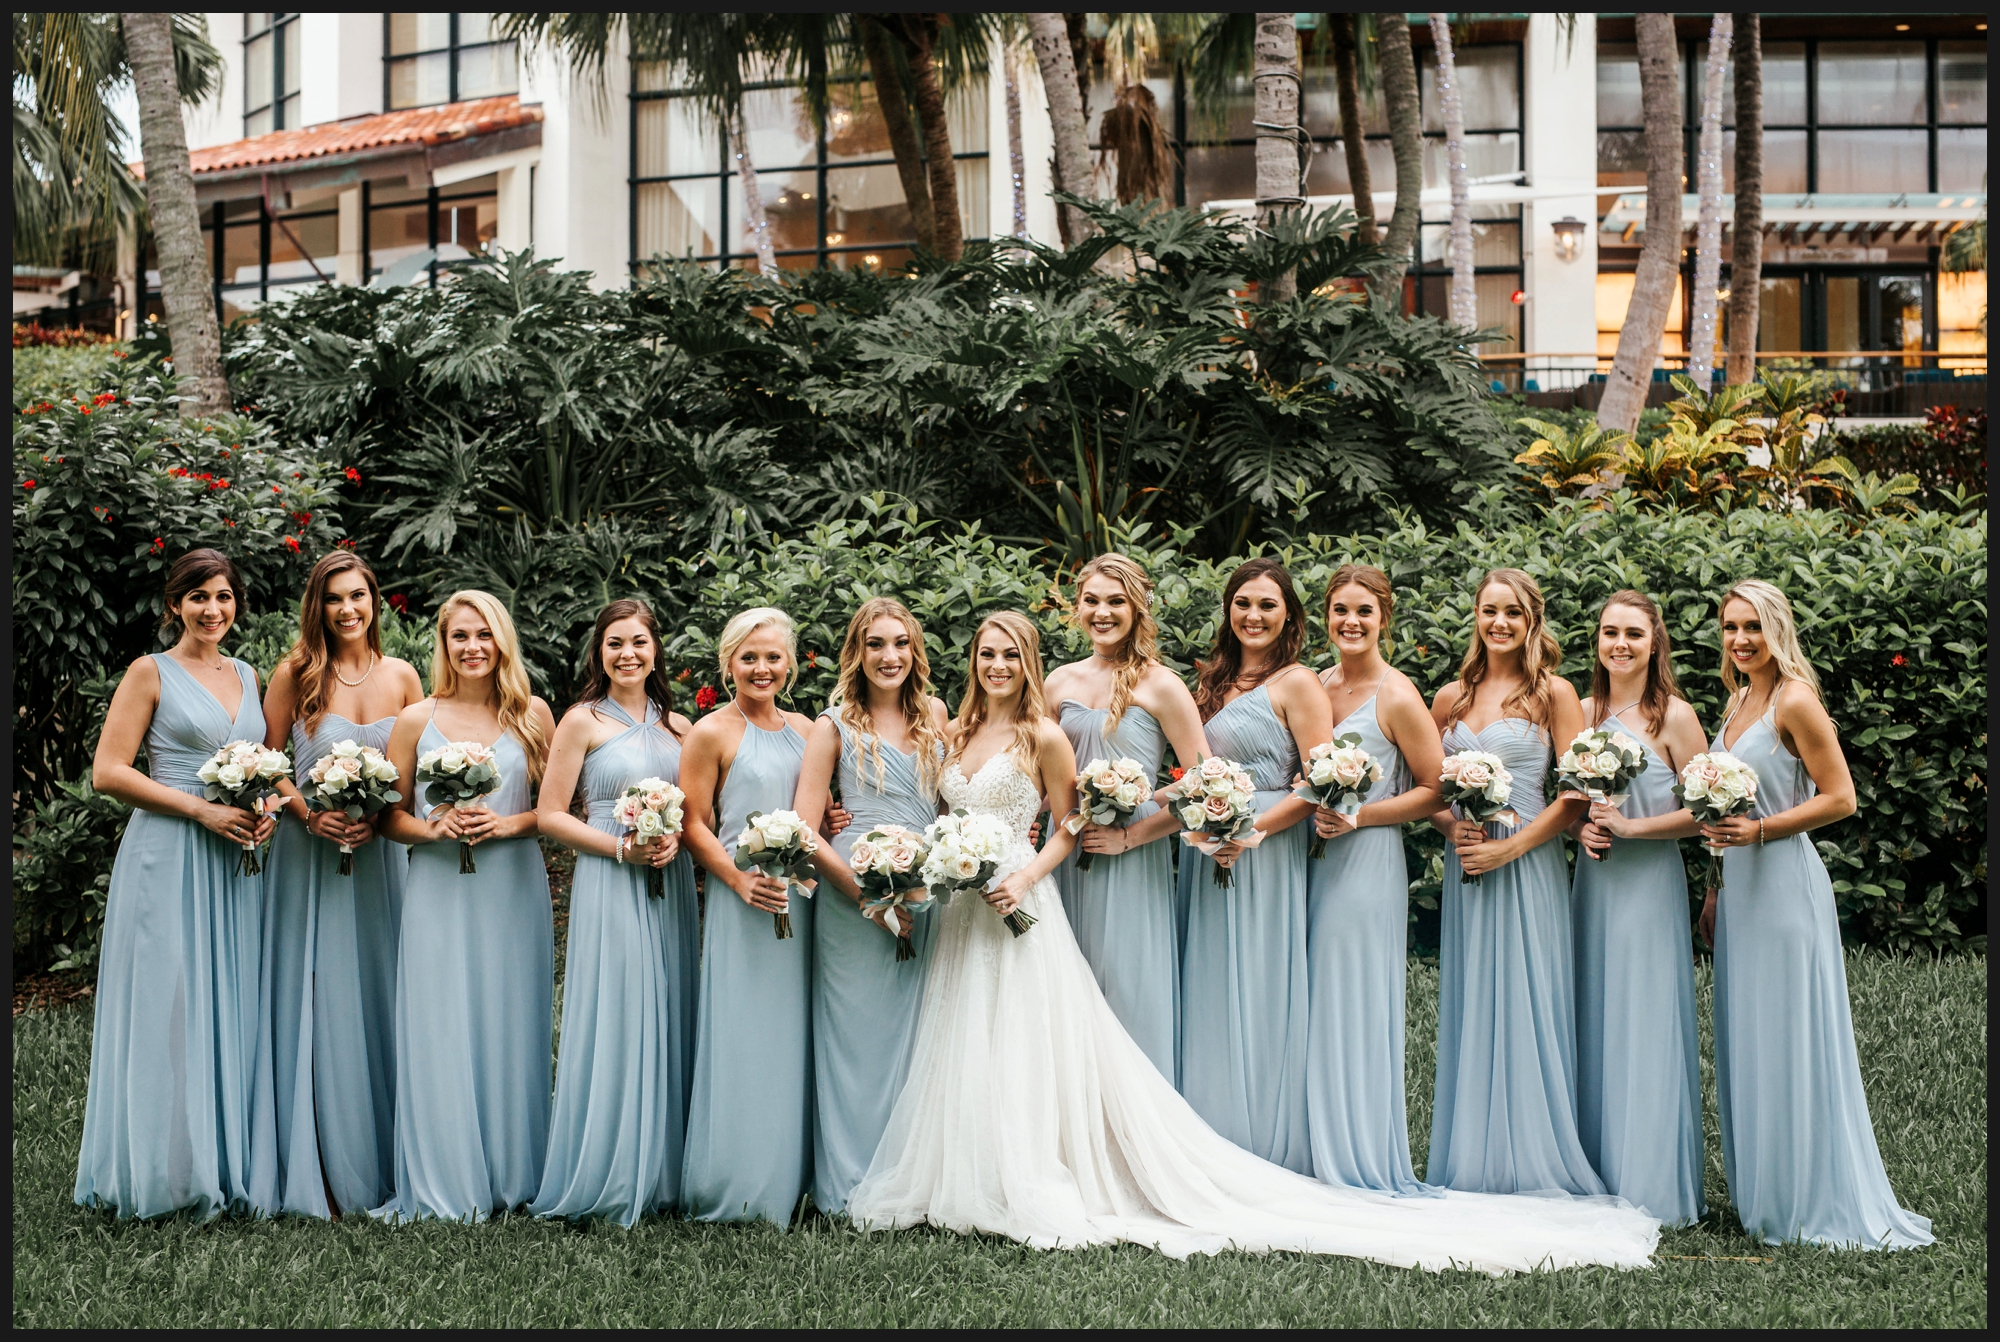 Orlando-Wedding-Photographer-destination-wedding-photographer-florida-wedding-photographer-bohemian-wedding-photographer_0062.jpg